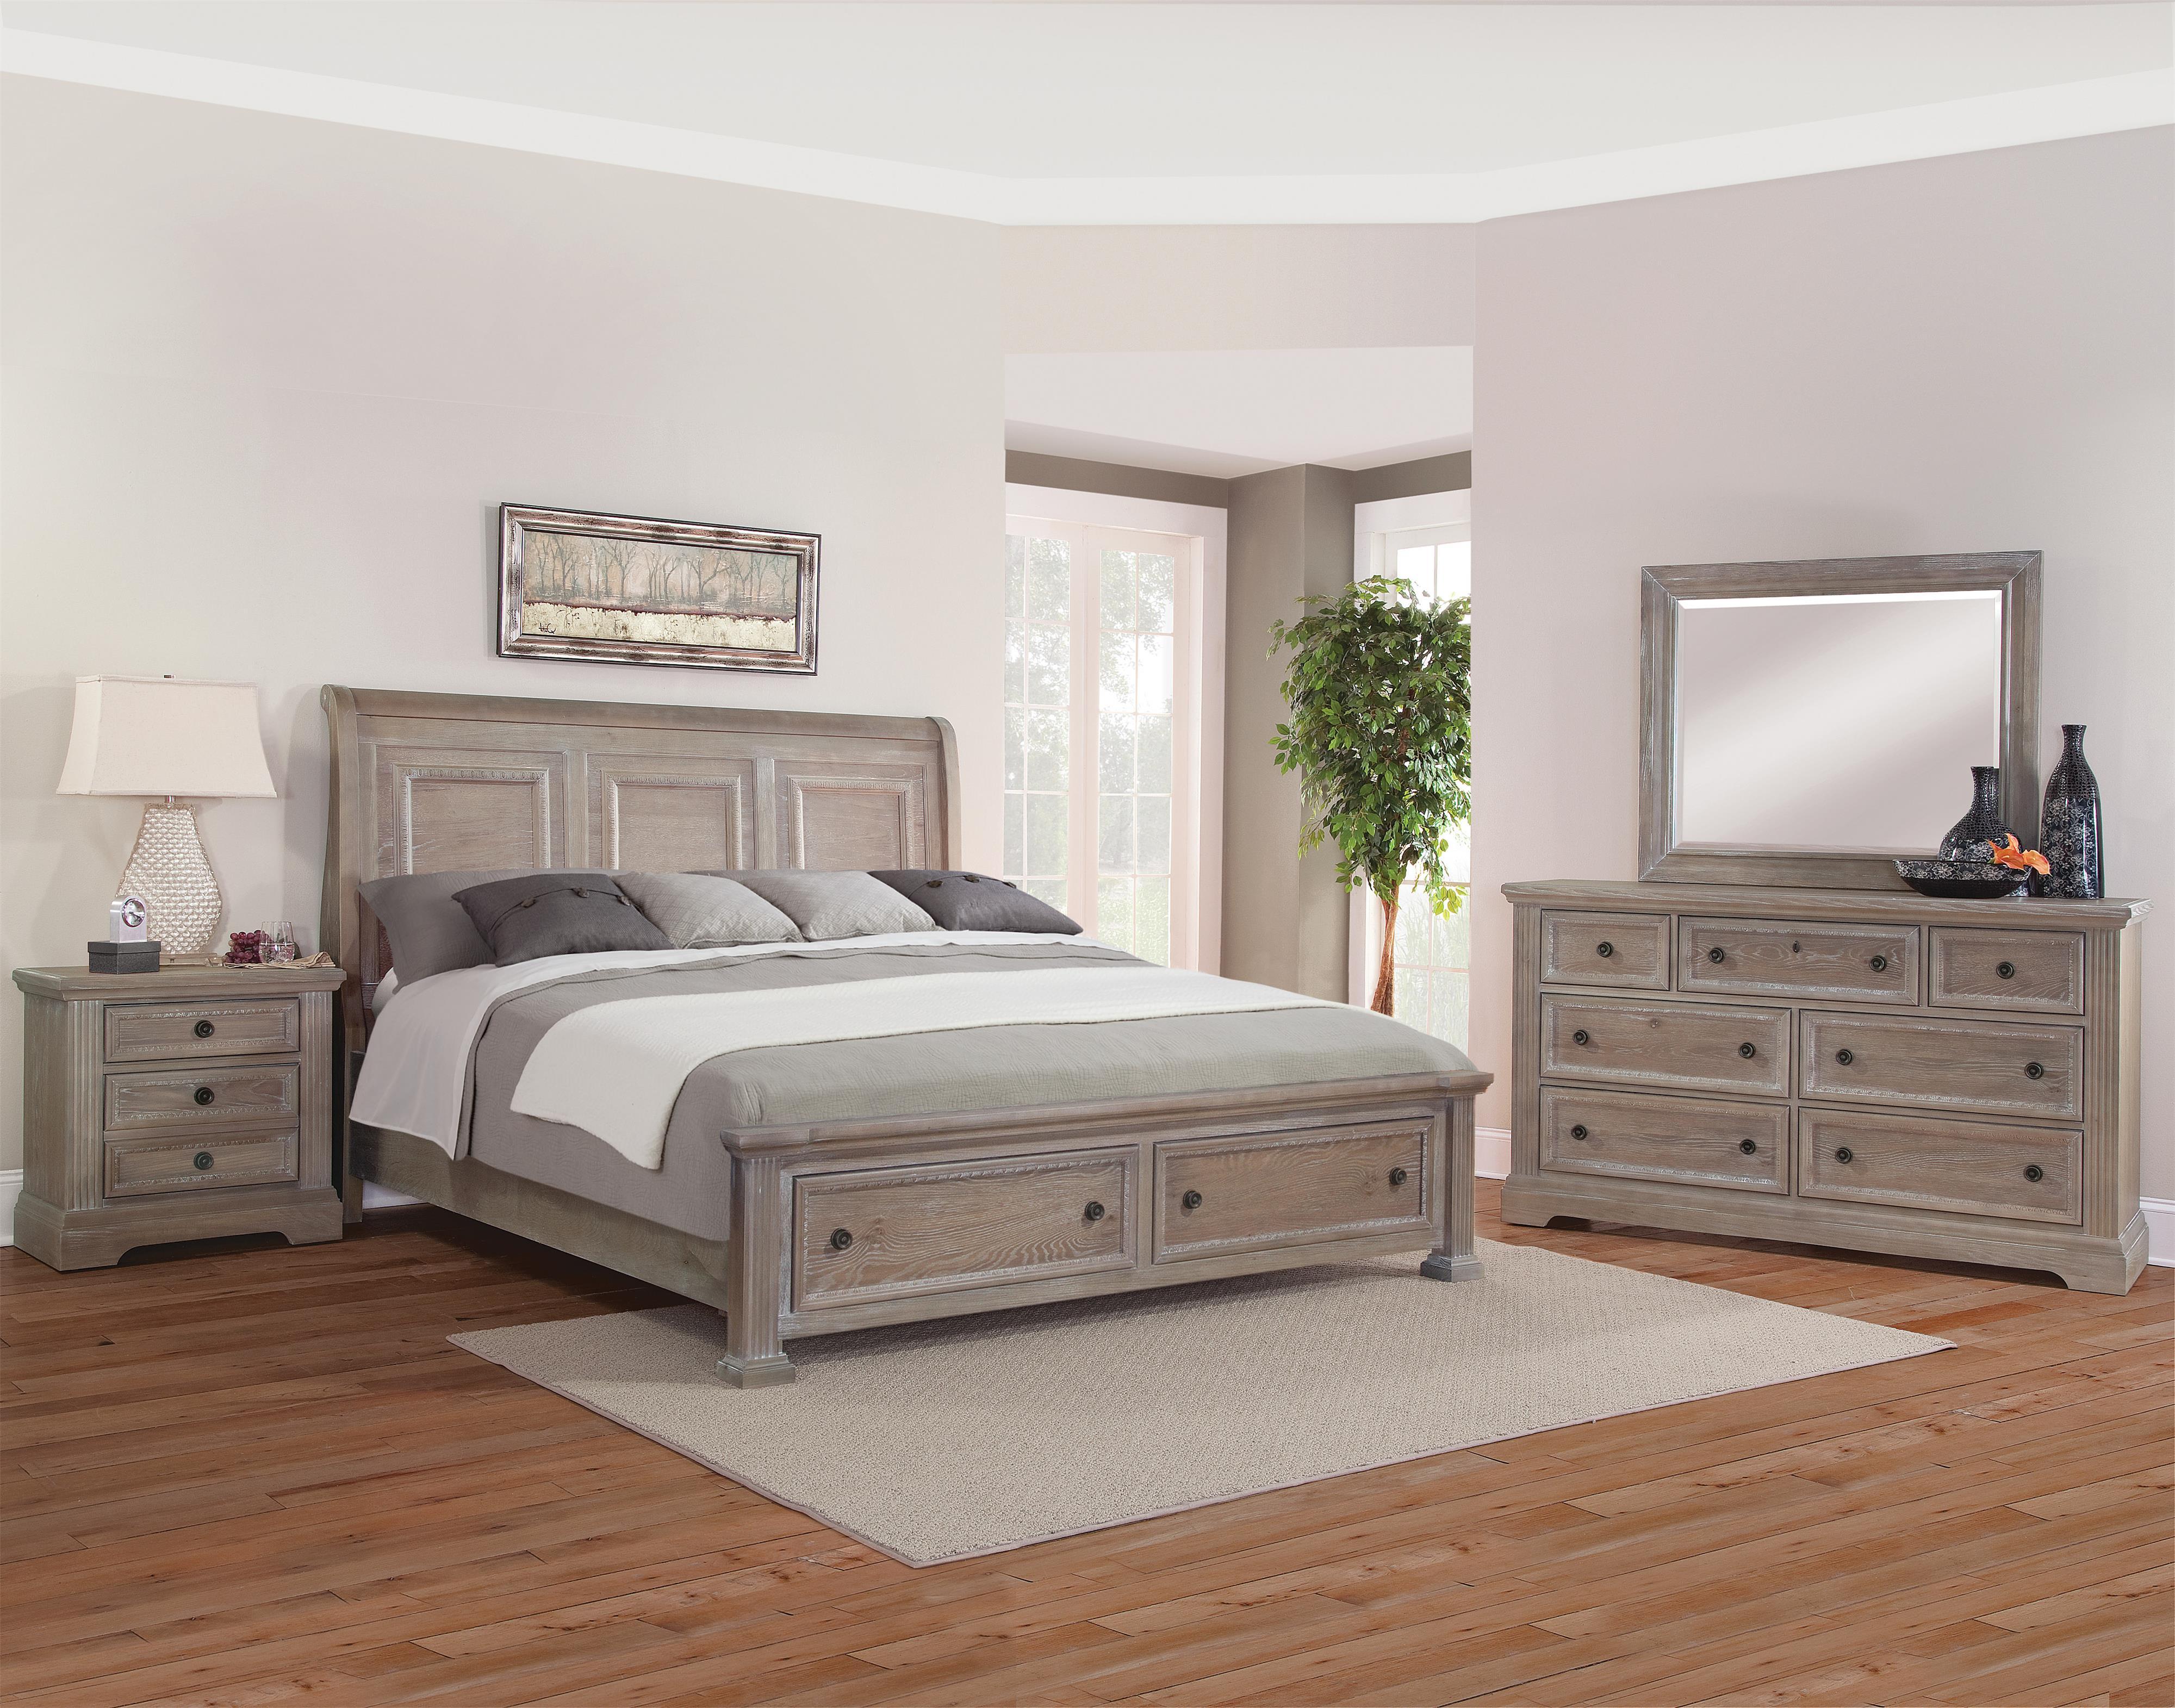 Vaughan Bassett Affinity King Bedroom Group - Item Number: 564 K Bedroom Group 4